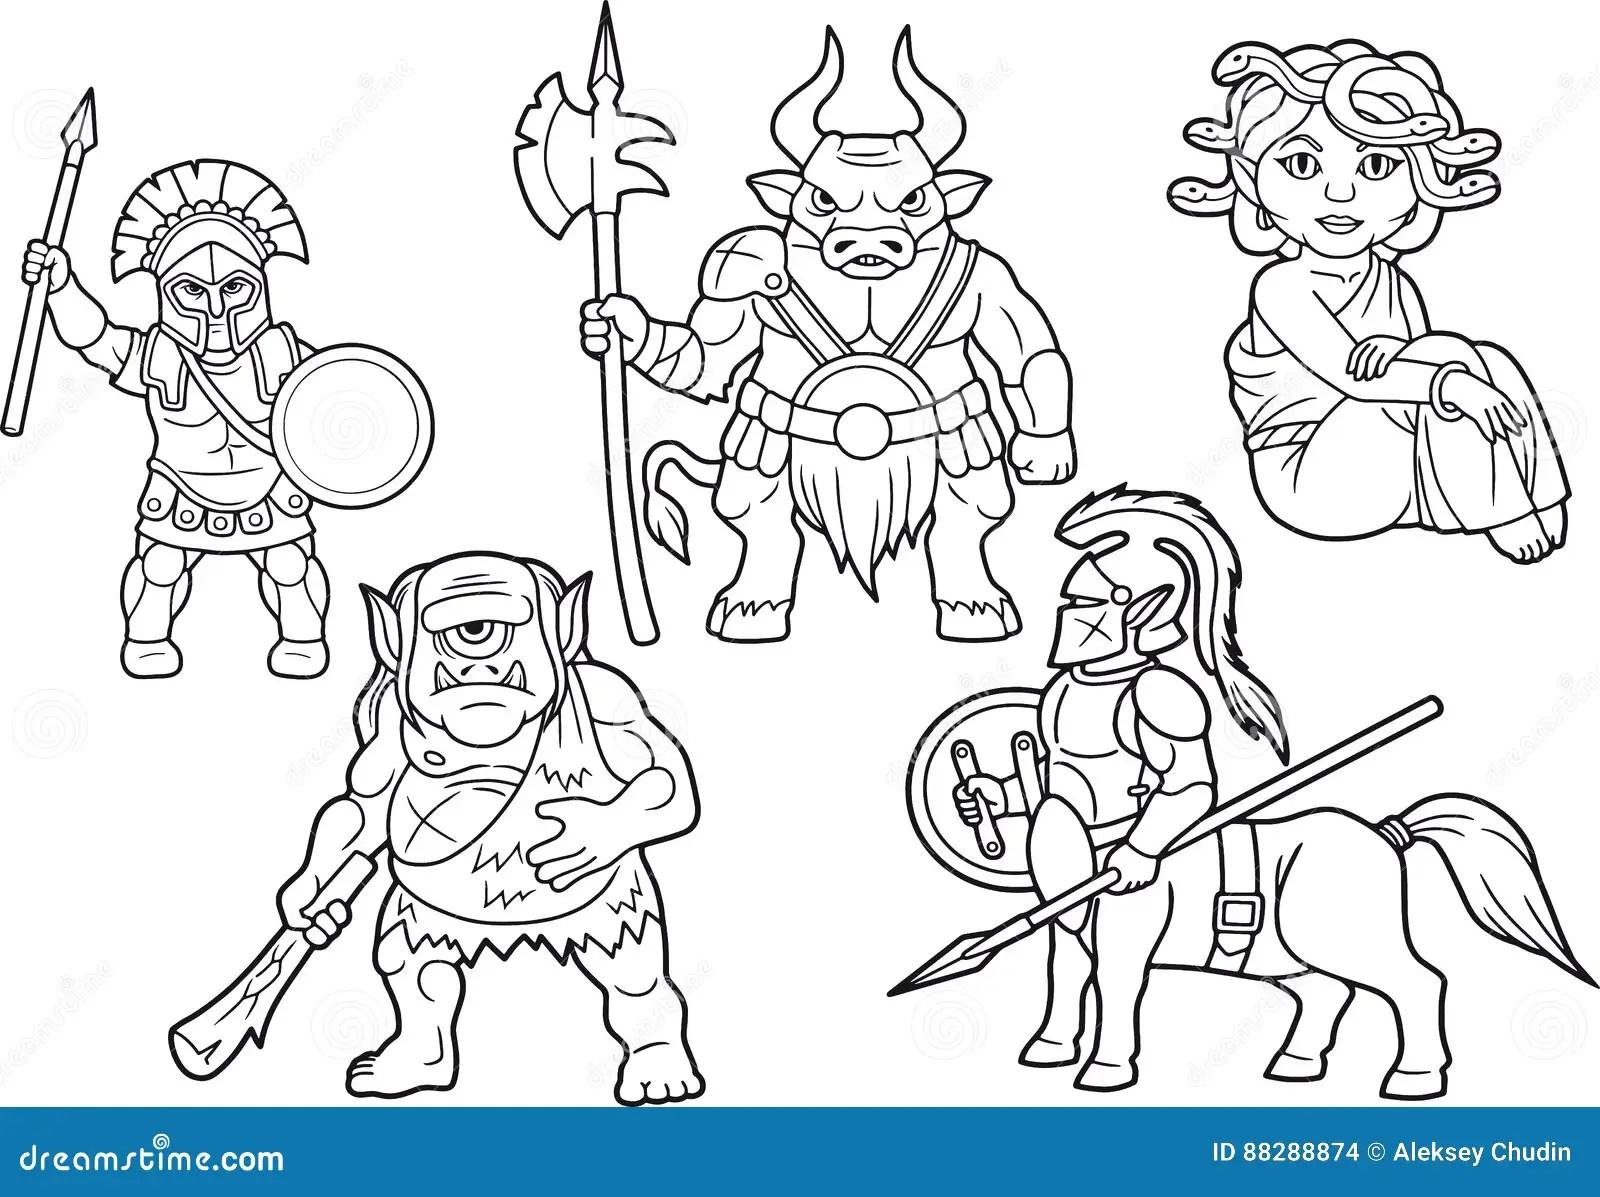 Minotaur Cartoons Illustrations Amp Vector Stock Images